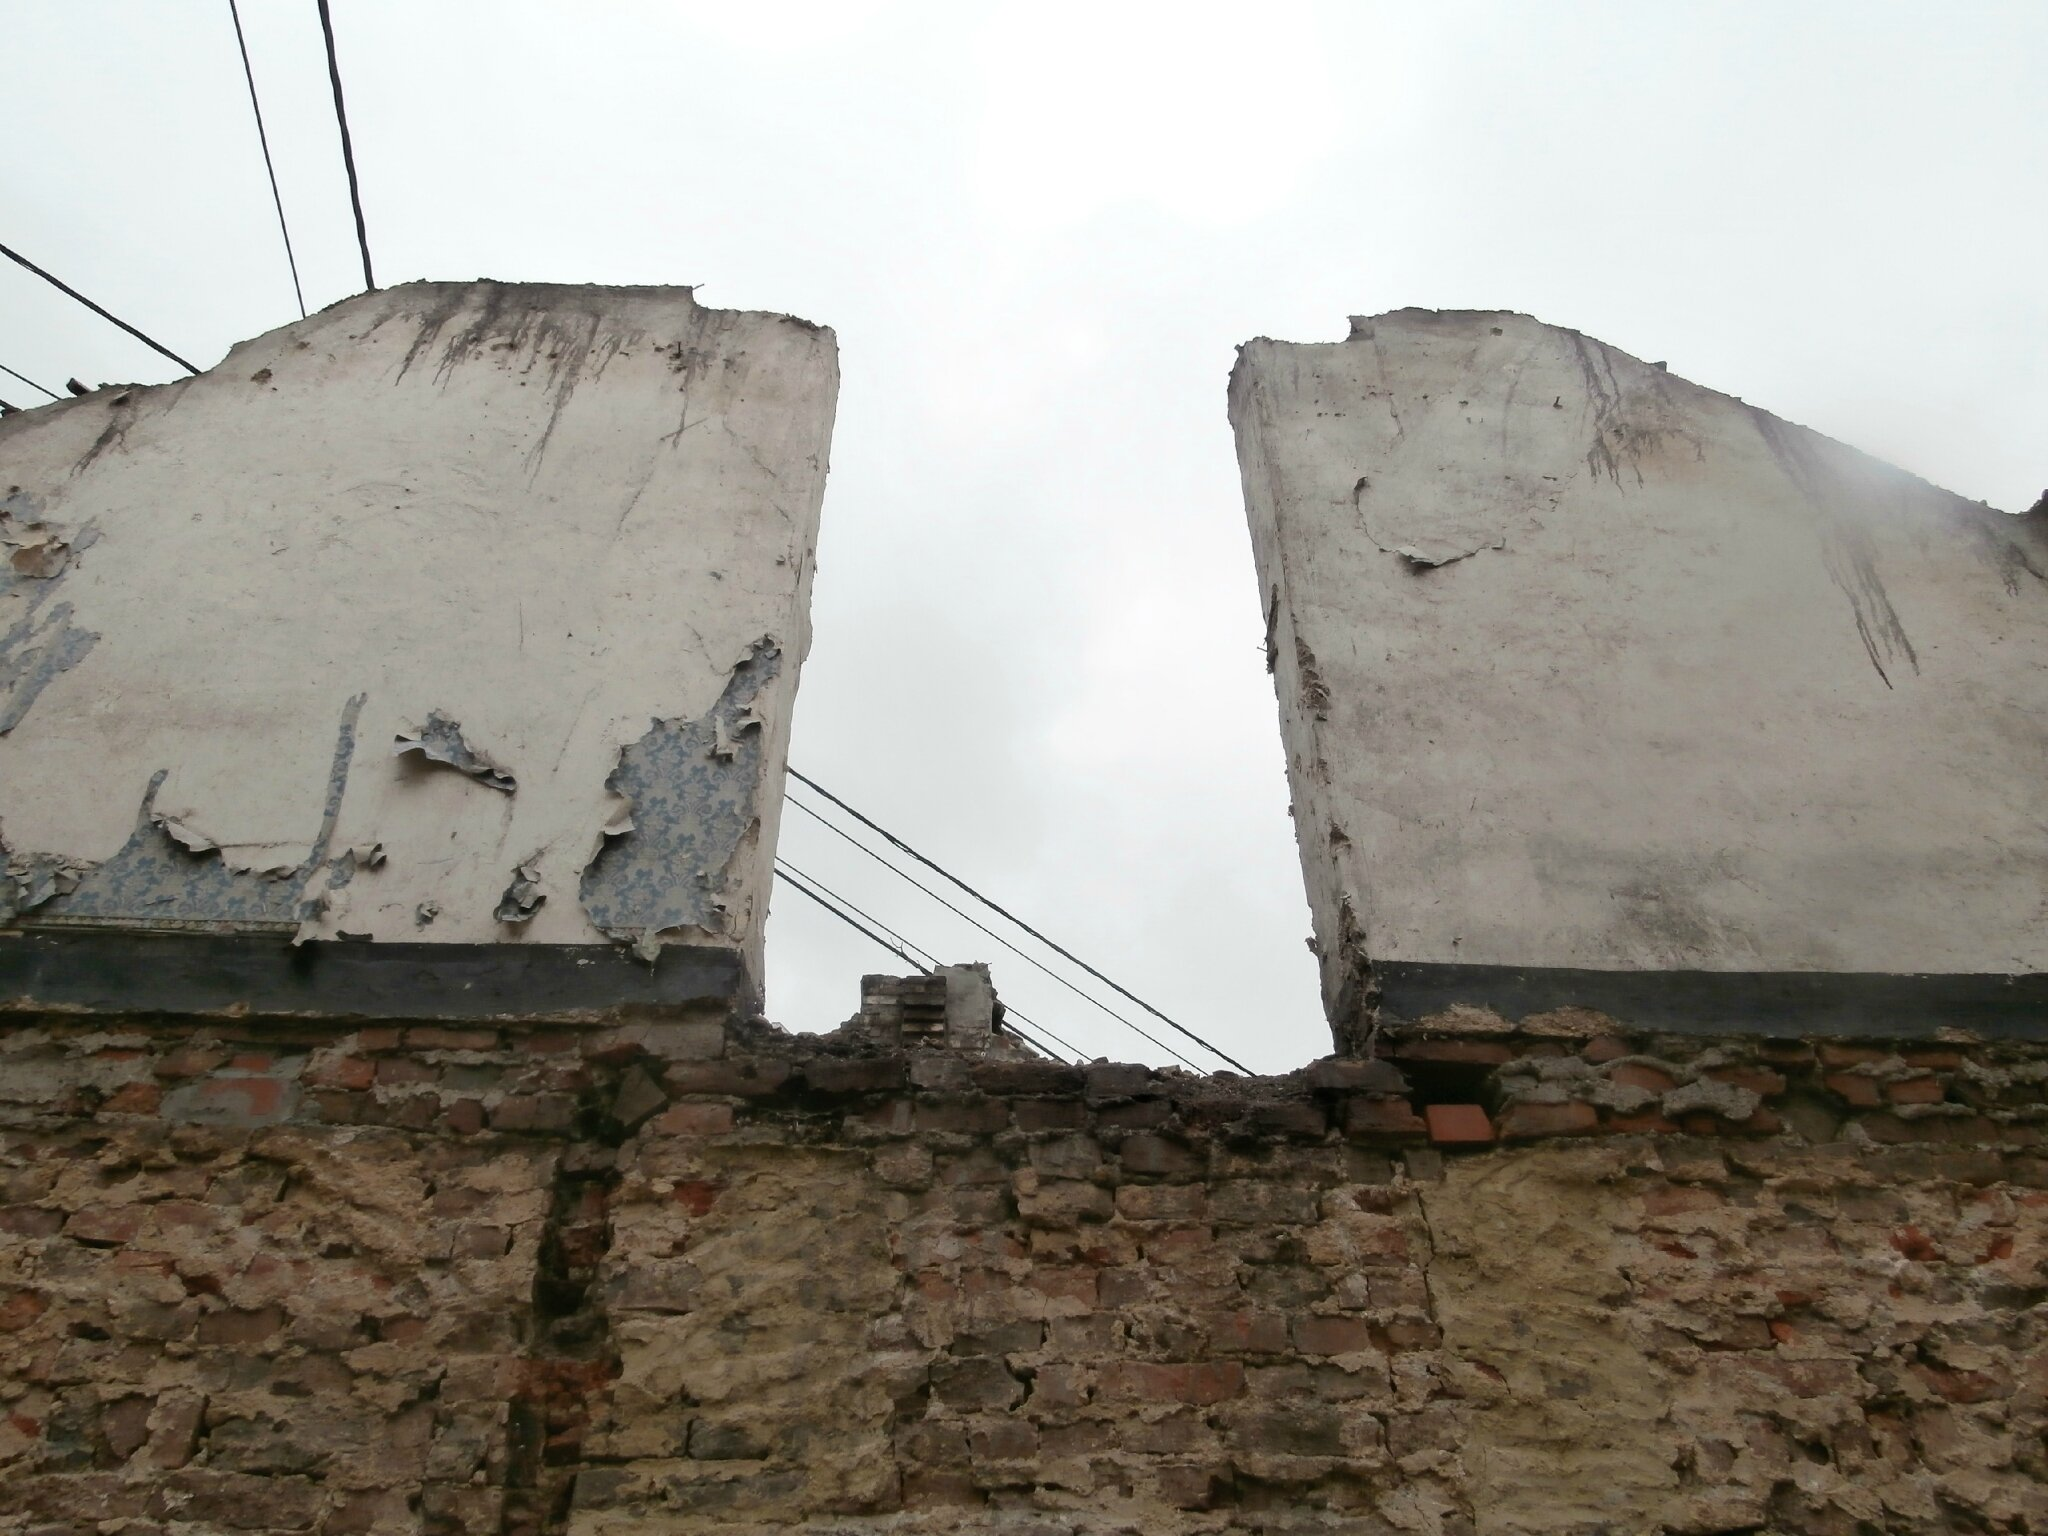 Maison Denis - 2014-07-21 - P7216362